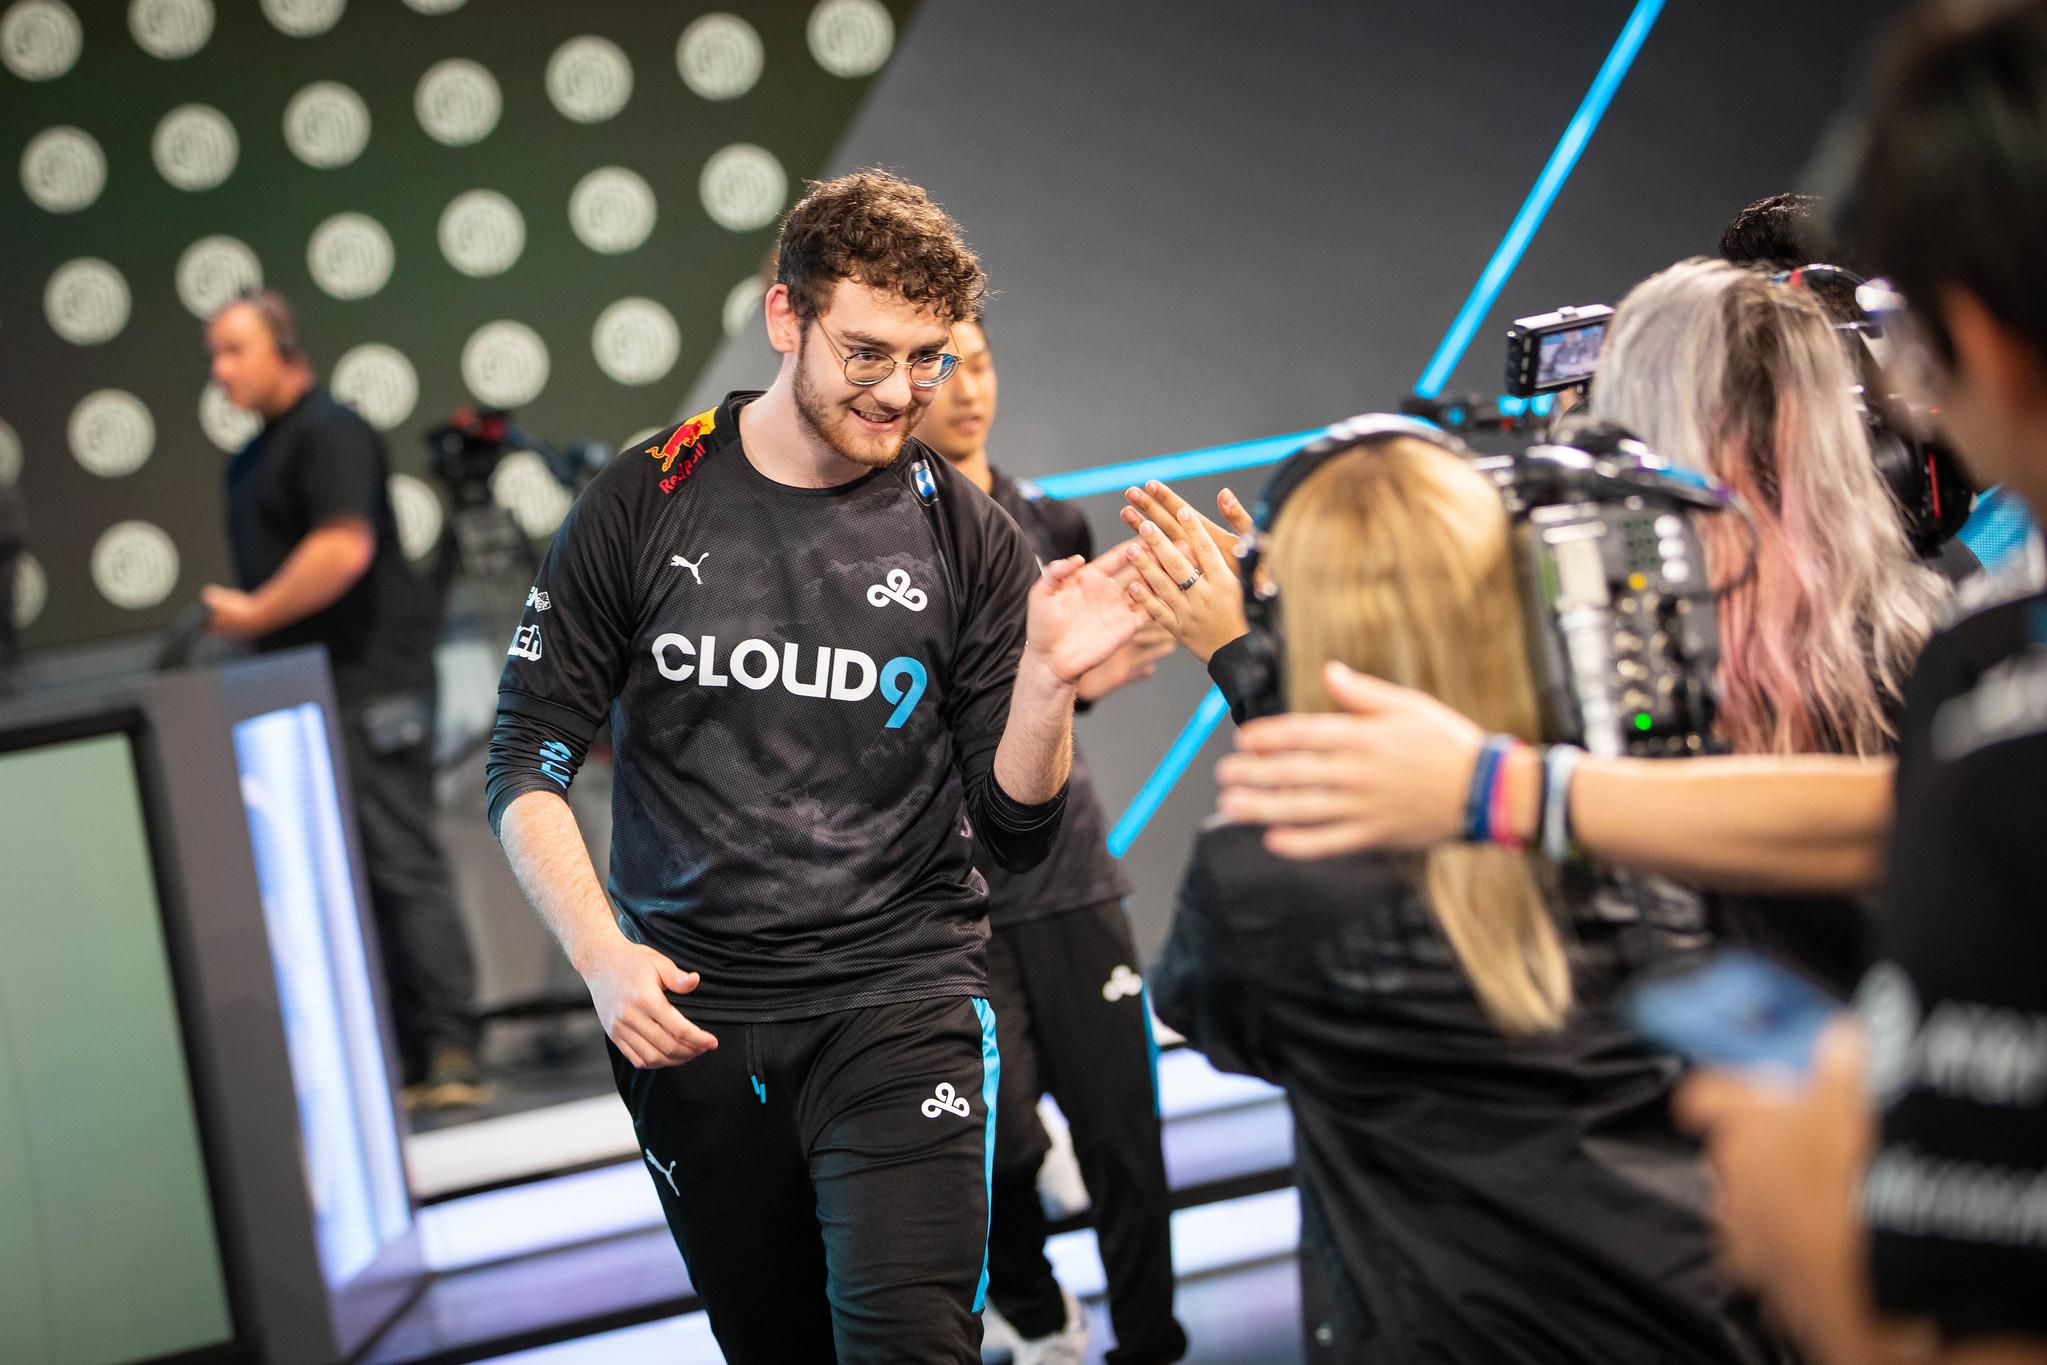 Vulcan high fiving Cloud9 fans at LCS